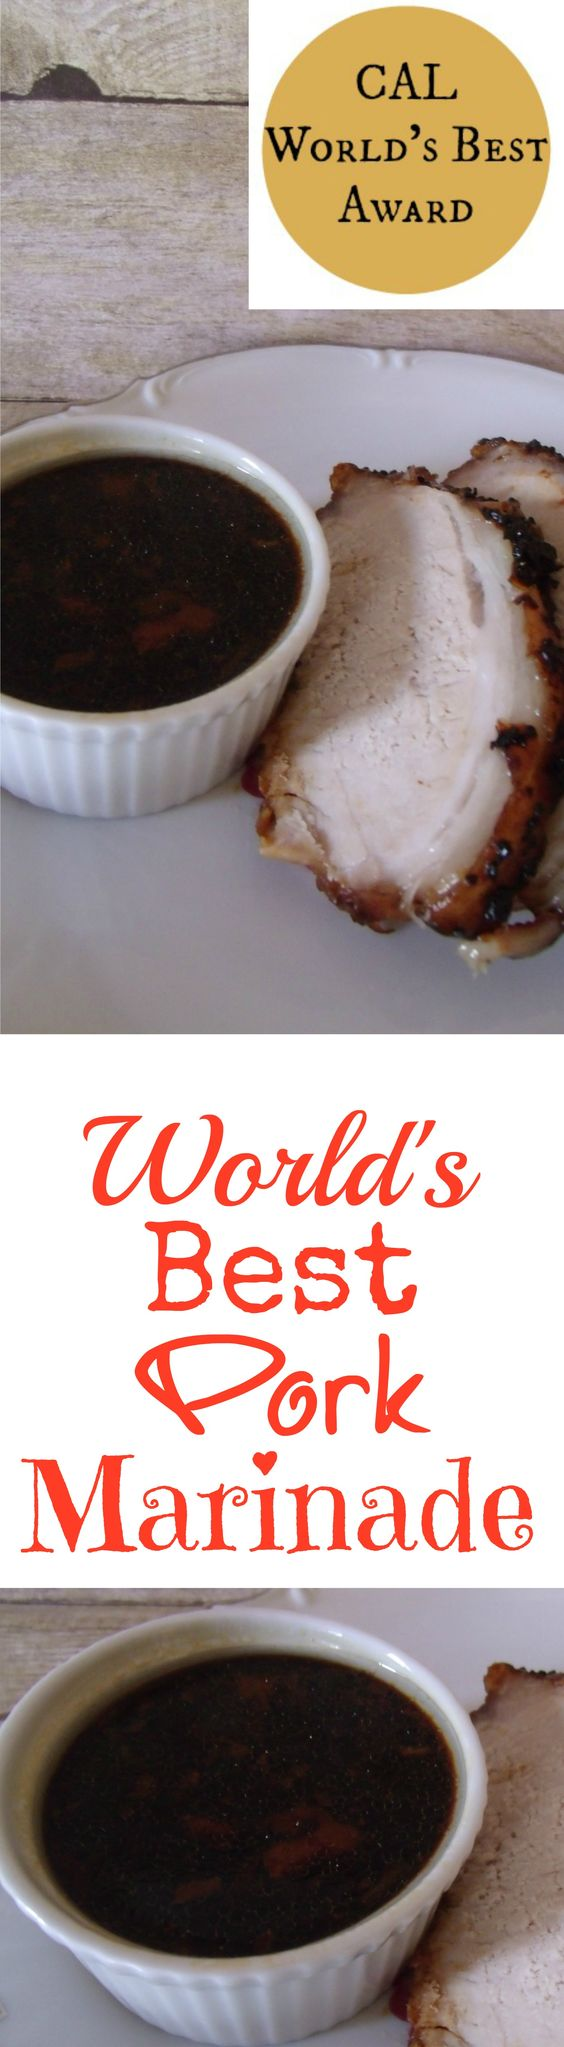 Quick pork marinade recipe